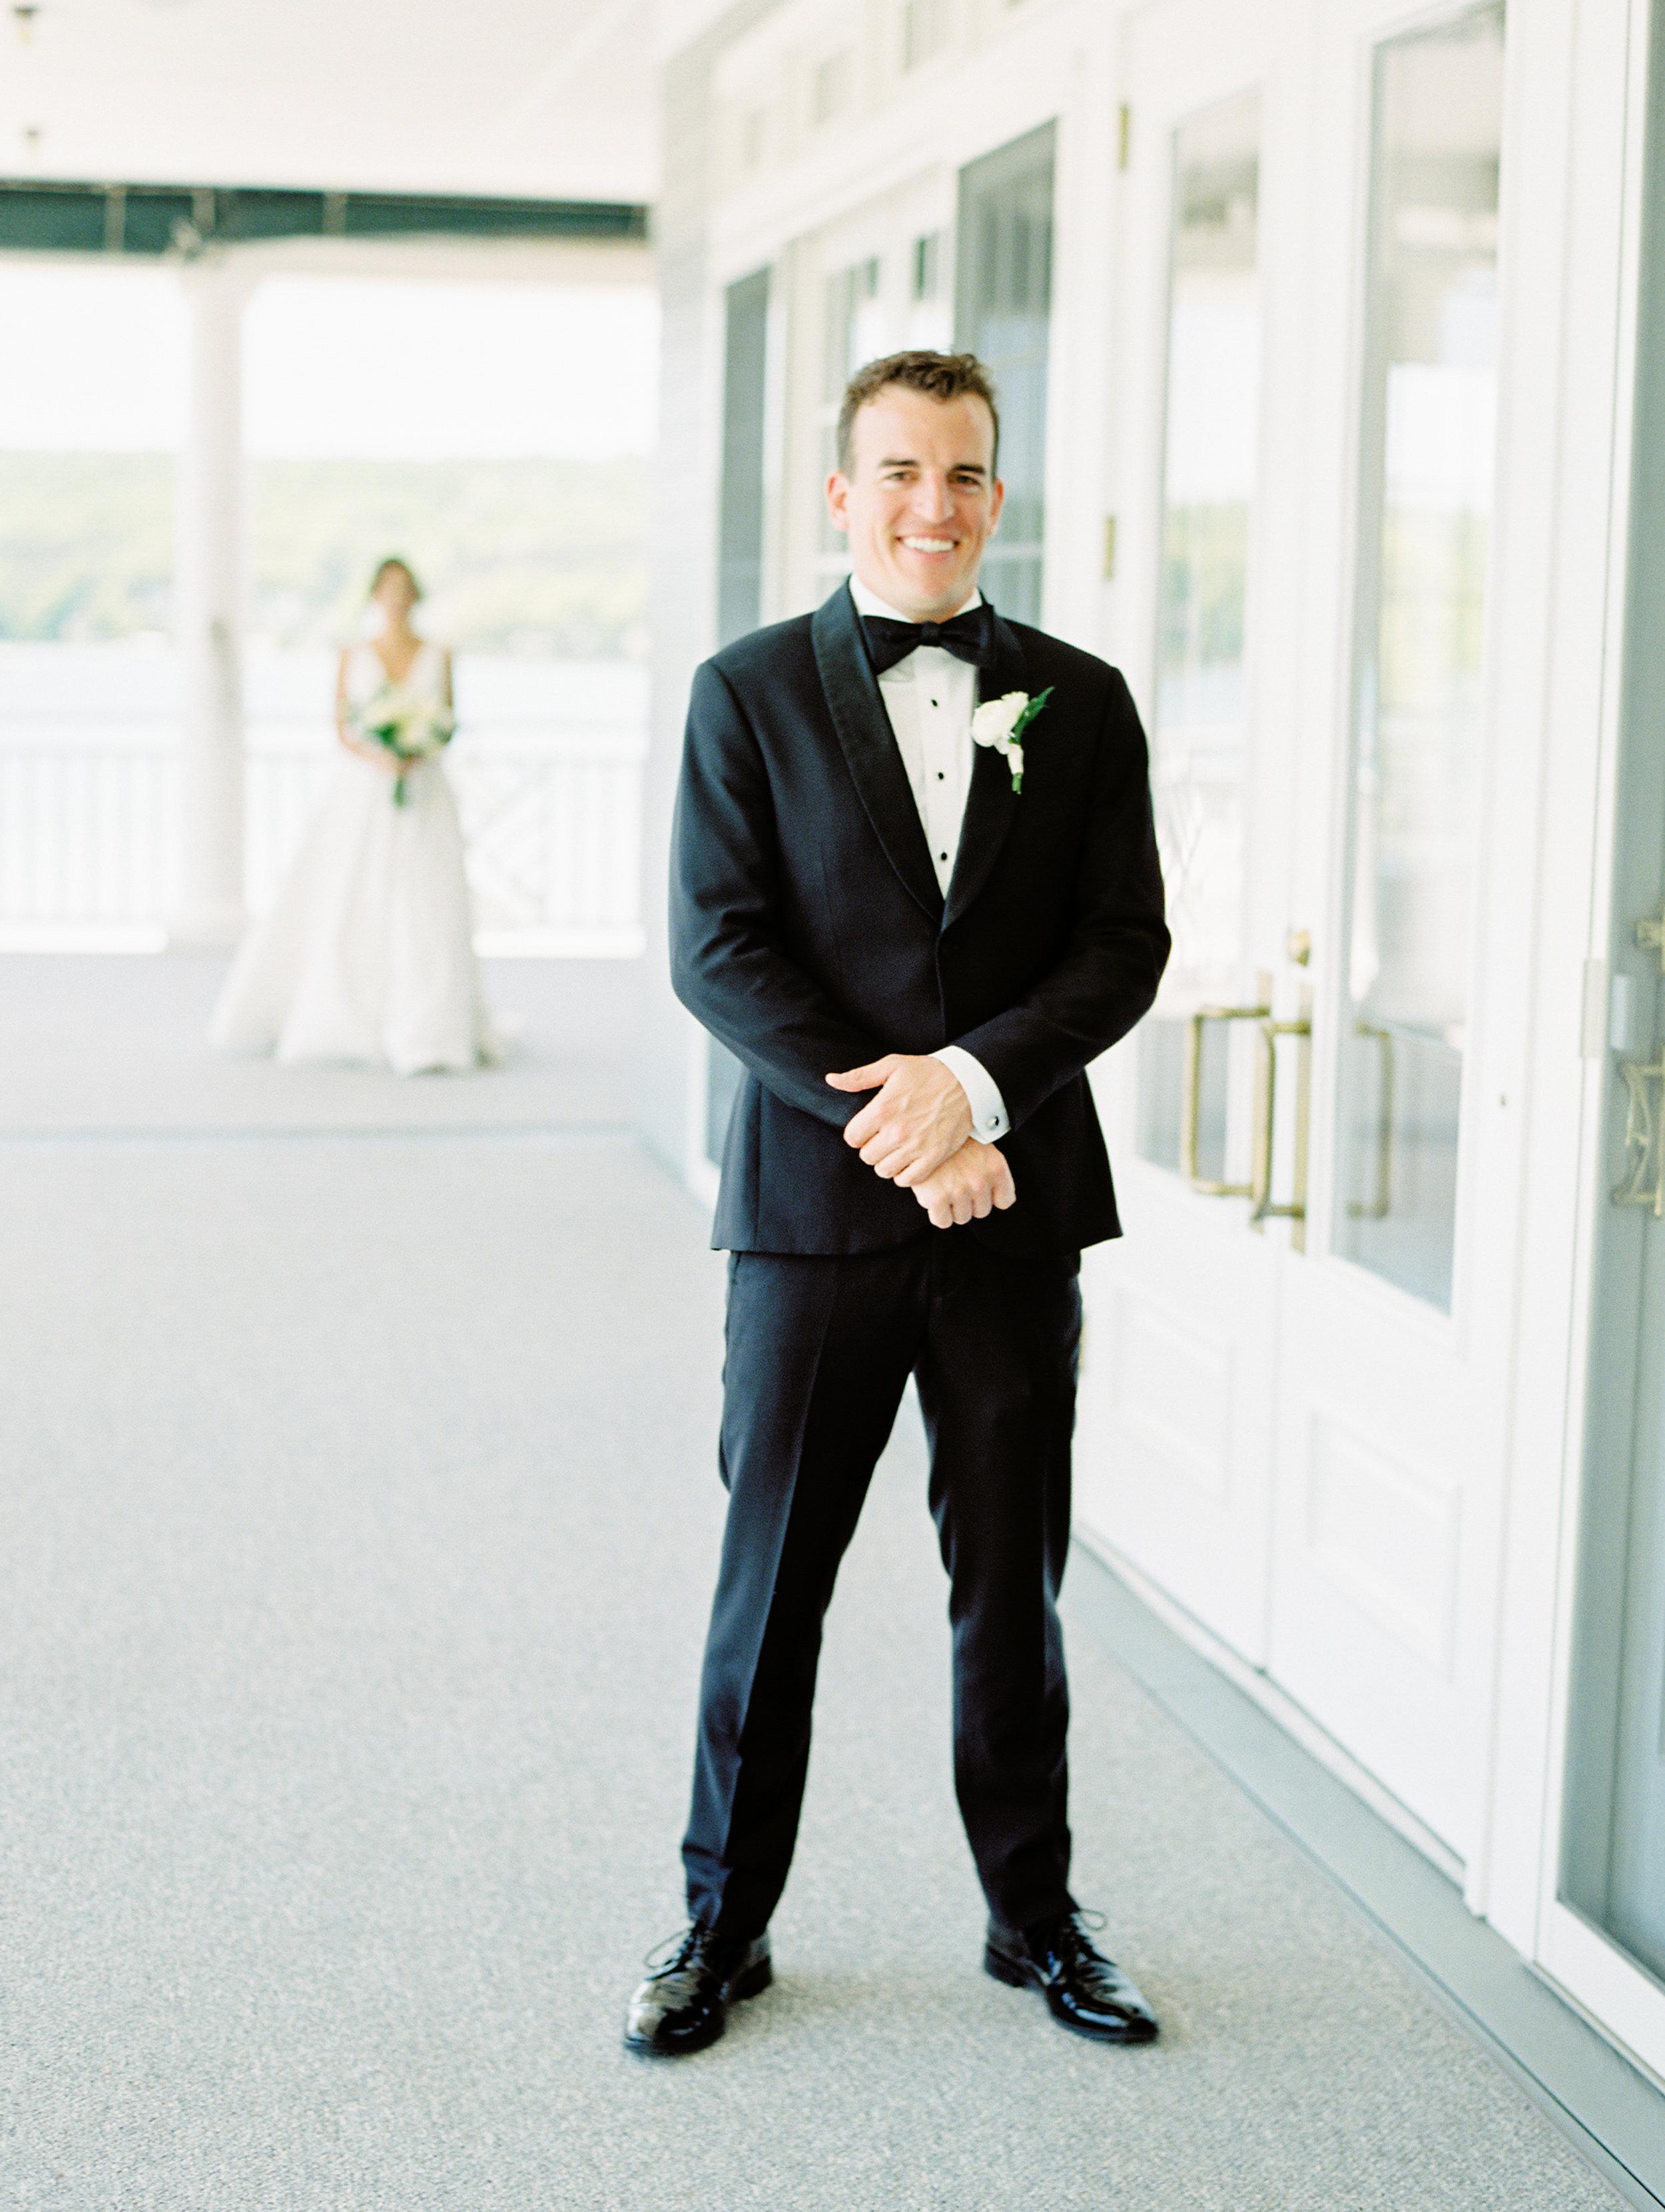 DeGuilio+Wedding+First+Lookf-4 copy.jpg